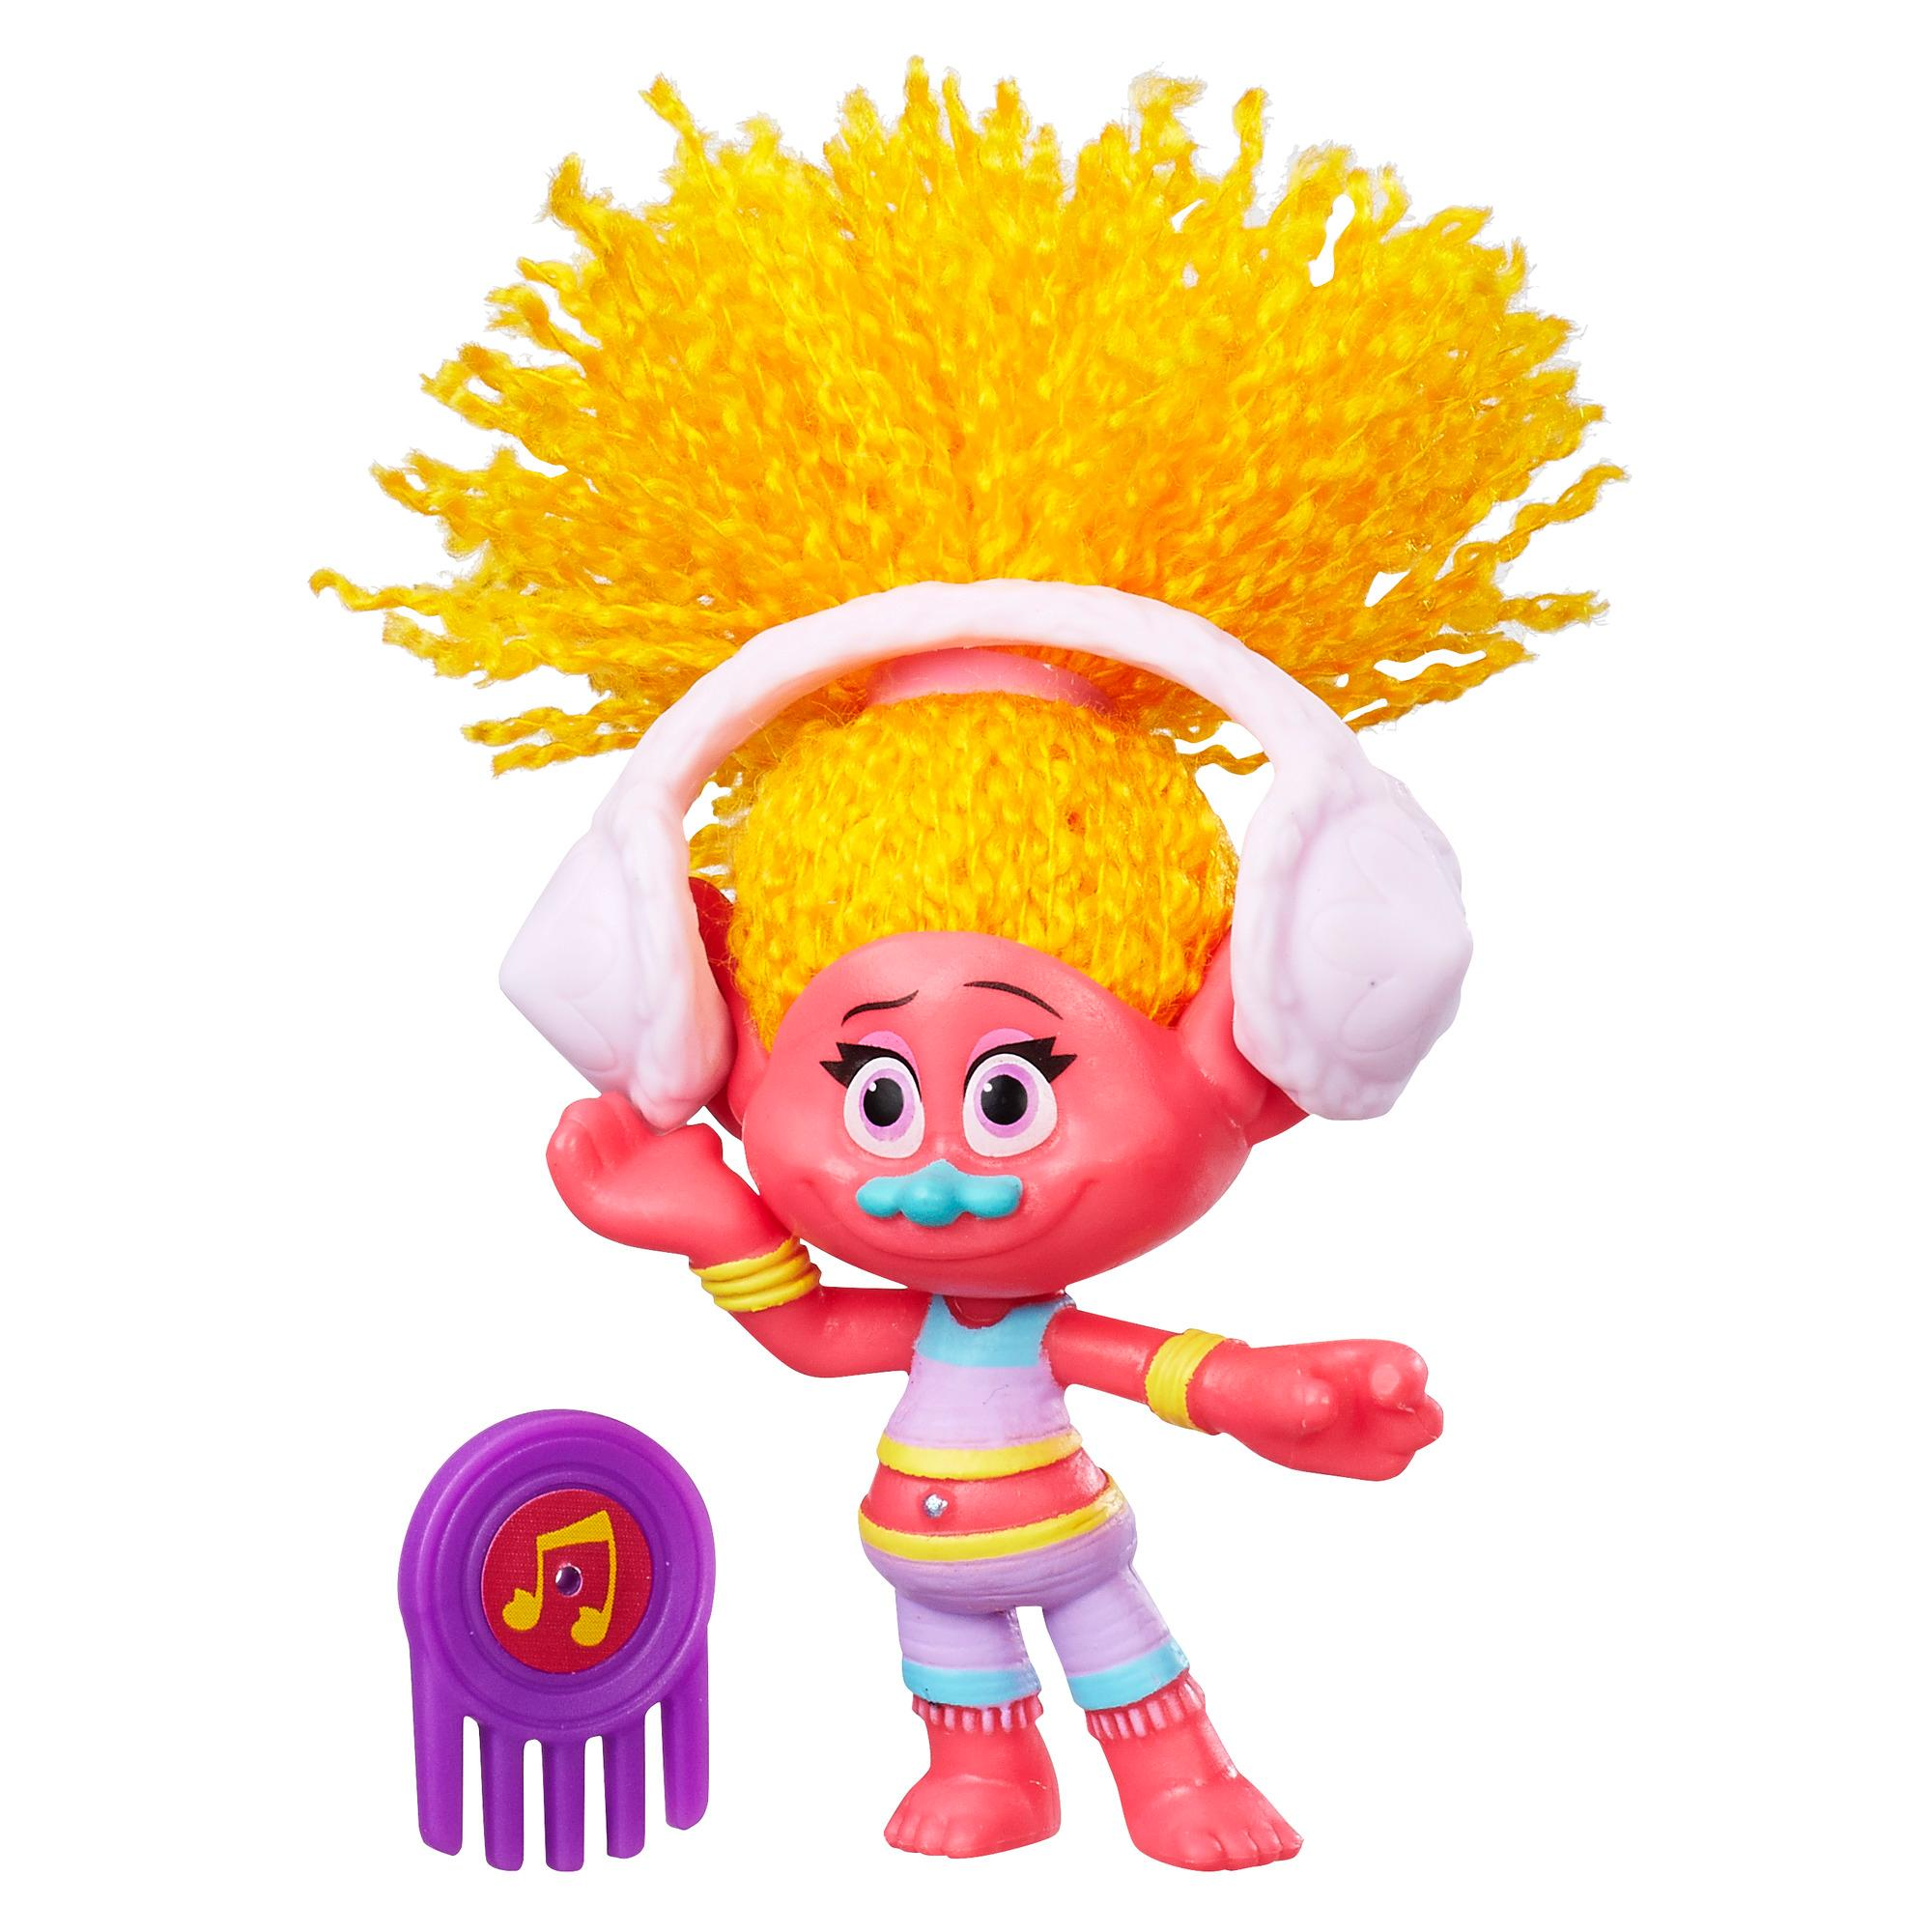 DreamWorks Trolls DJ Suki Collectible Figure